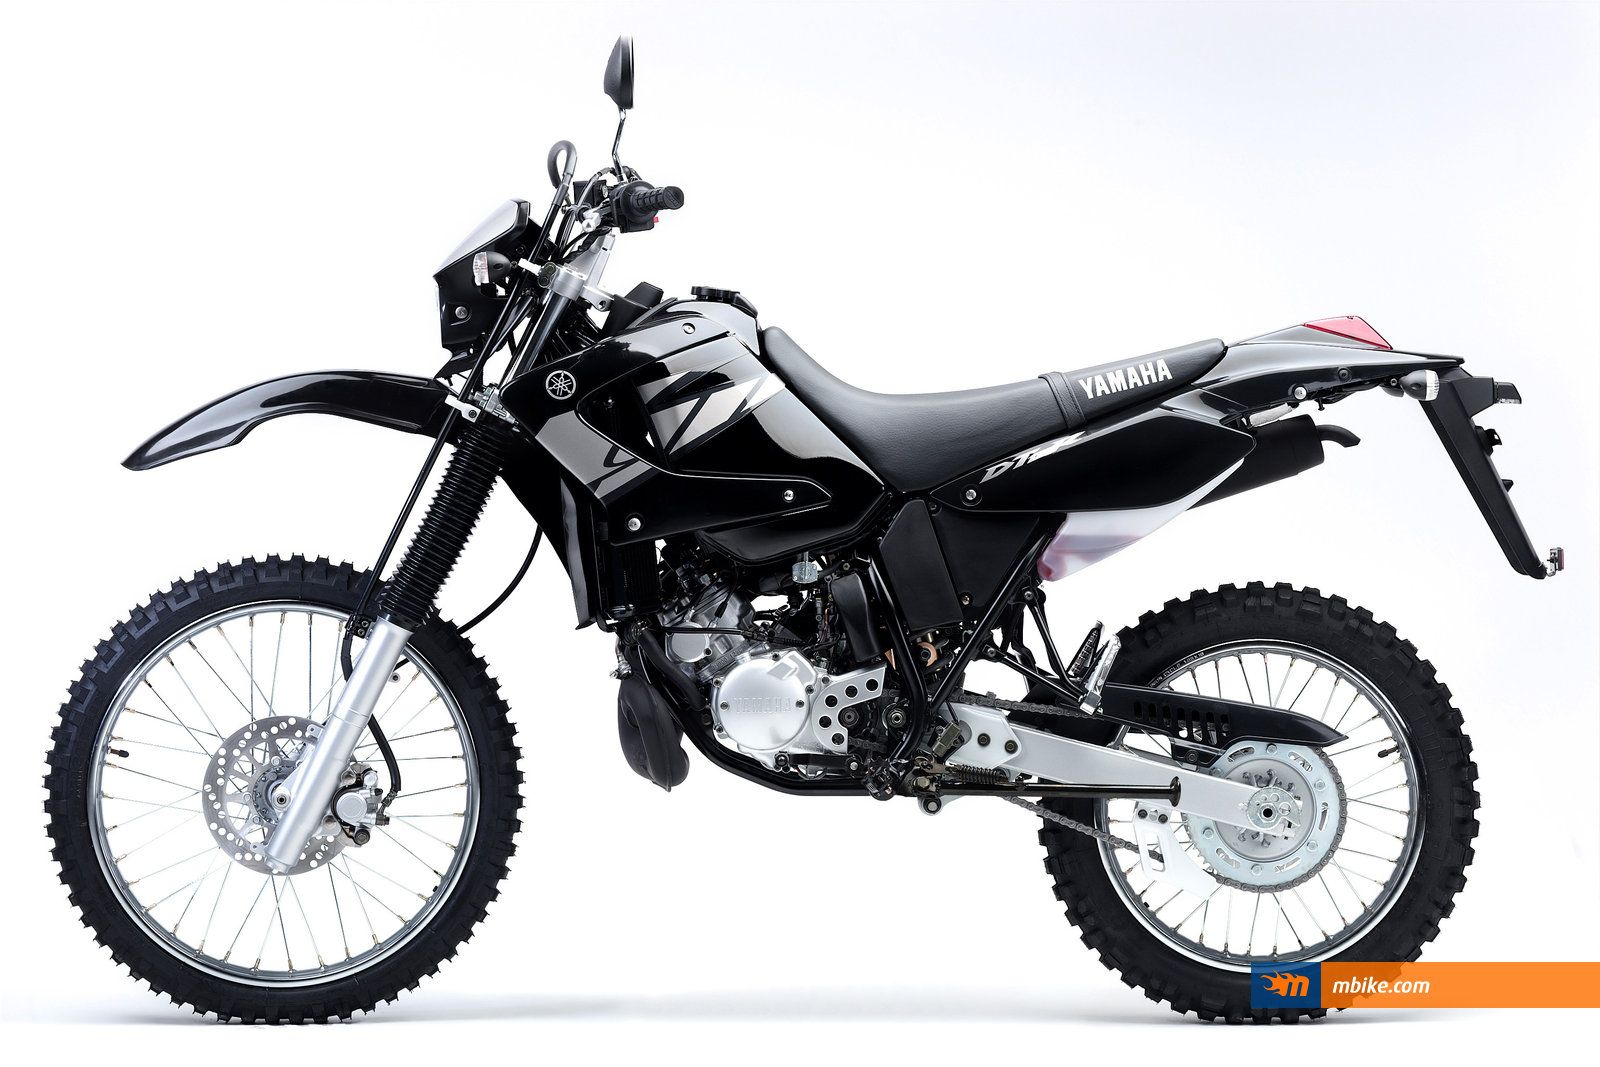 click on image to download 2005 yamaha dt125x dt125re service rh pinterest  com Yamaha TTR 125 Dirt Bike Yamaha TTR 125 Dirt Bike